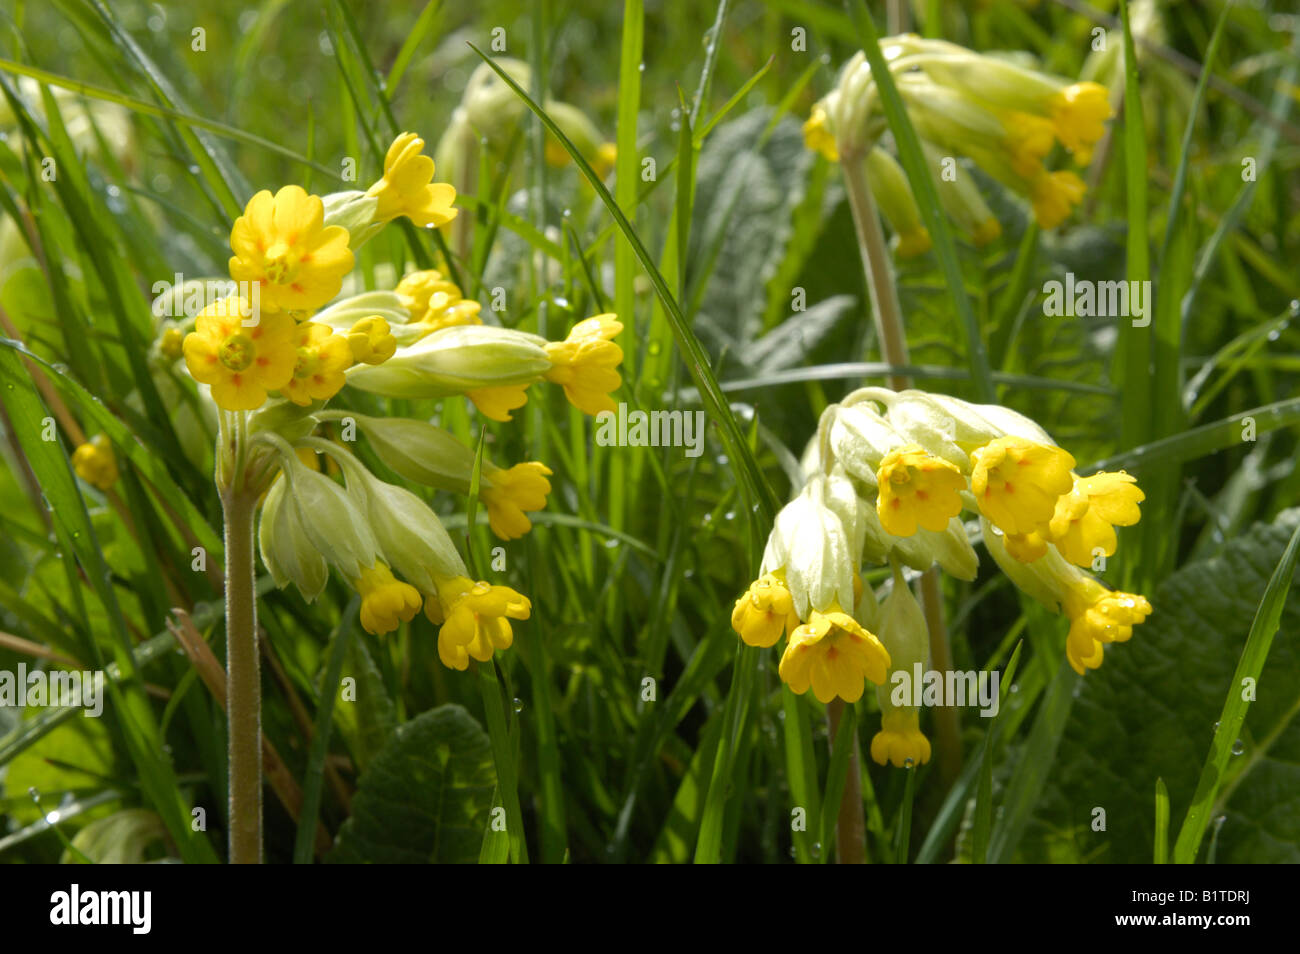 Cowslips (Primula veris) in Field - Stock Image